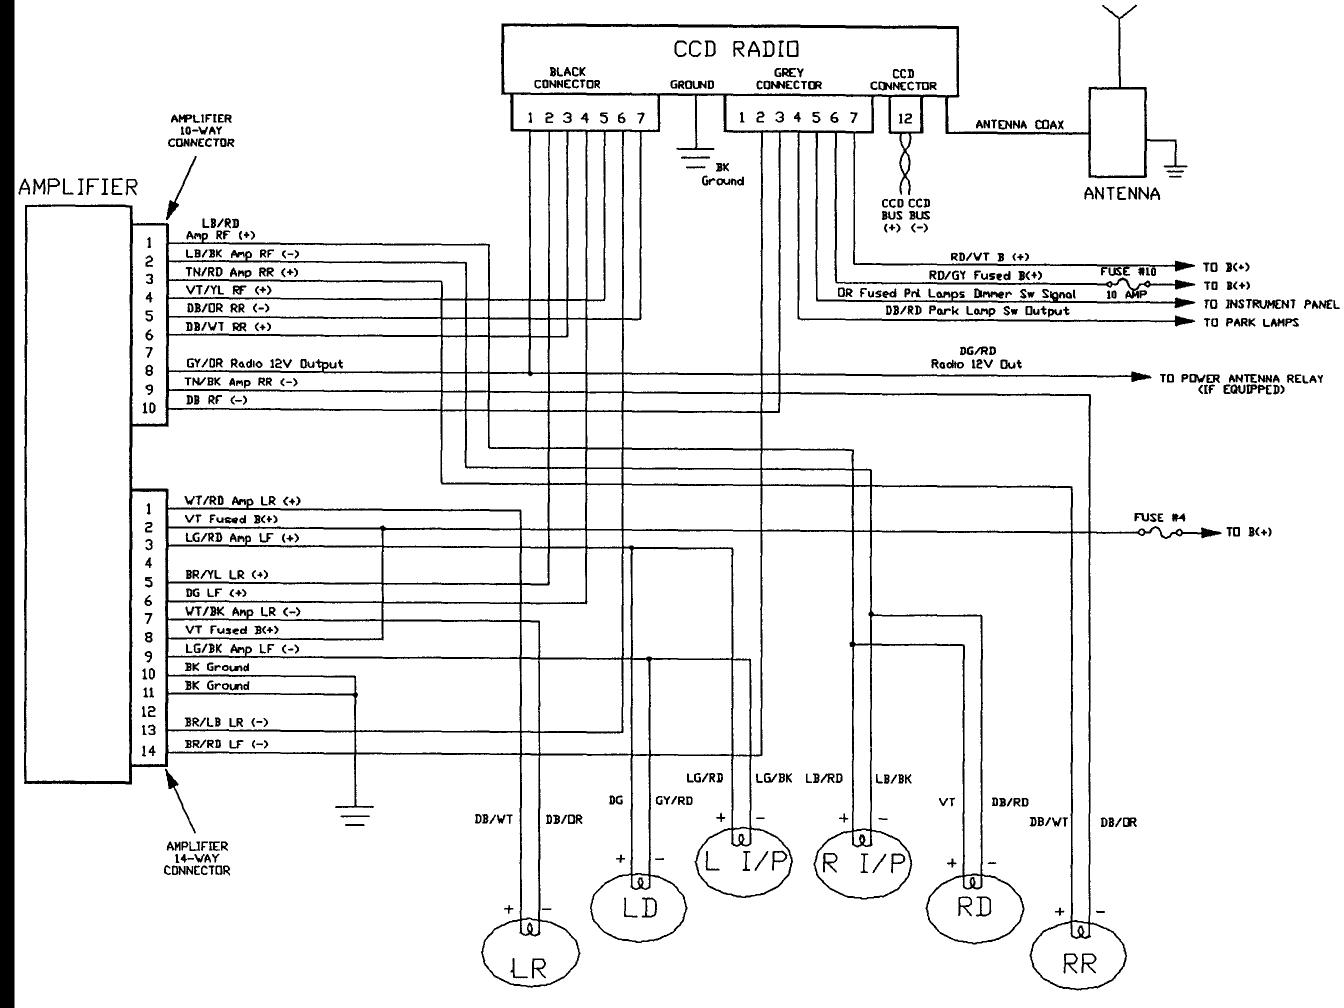 2015 Jeep Grand Cherokee Radio Wiring Diagram New 95 Stereo - Hbphelp - 1995 Jeep Cherokee Wiring Diagram